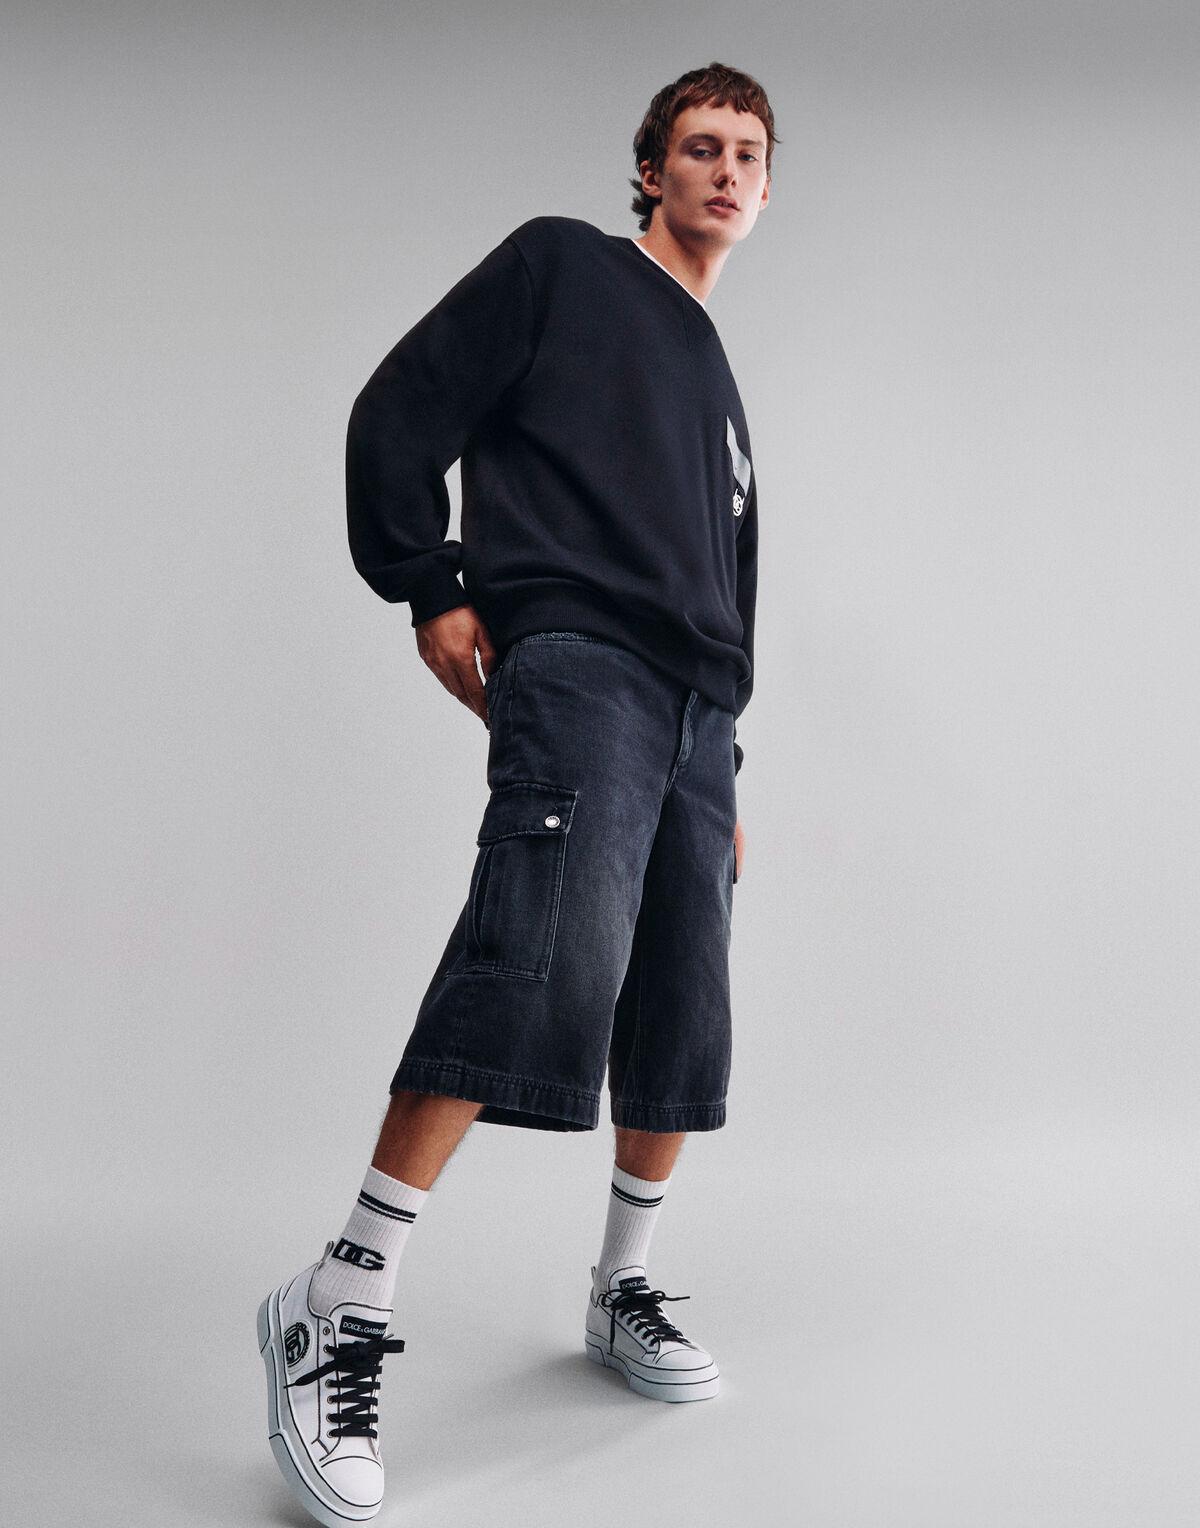 Jersey sweatshirt with DG patch